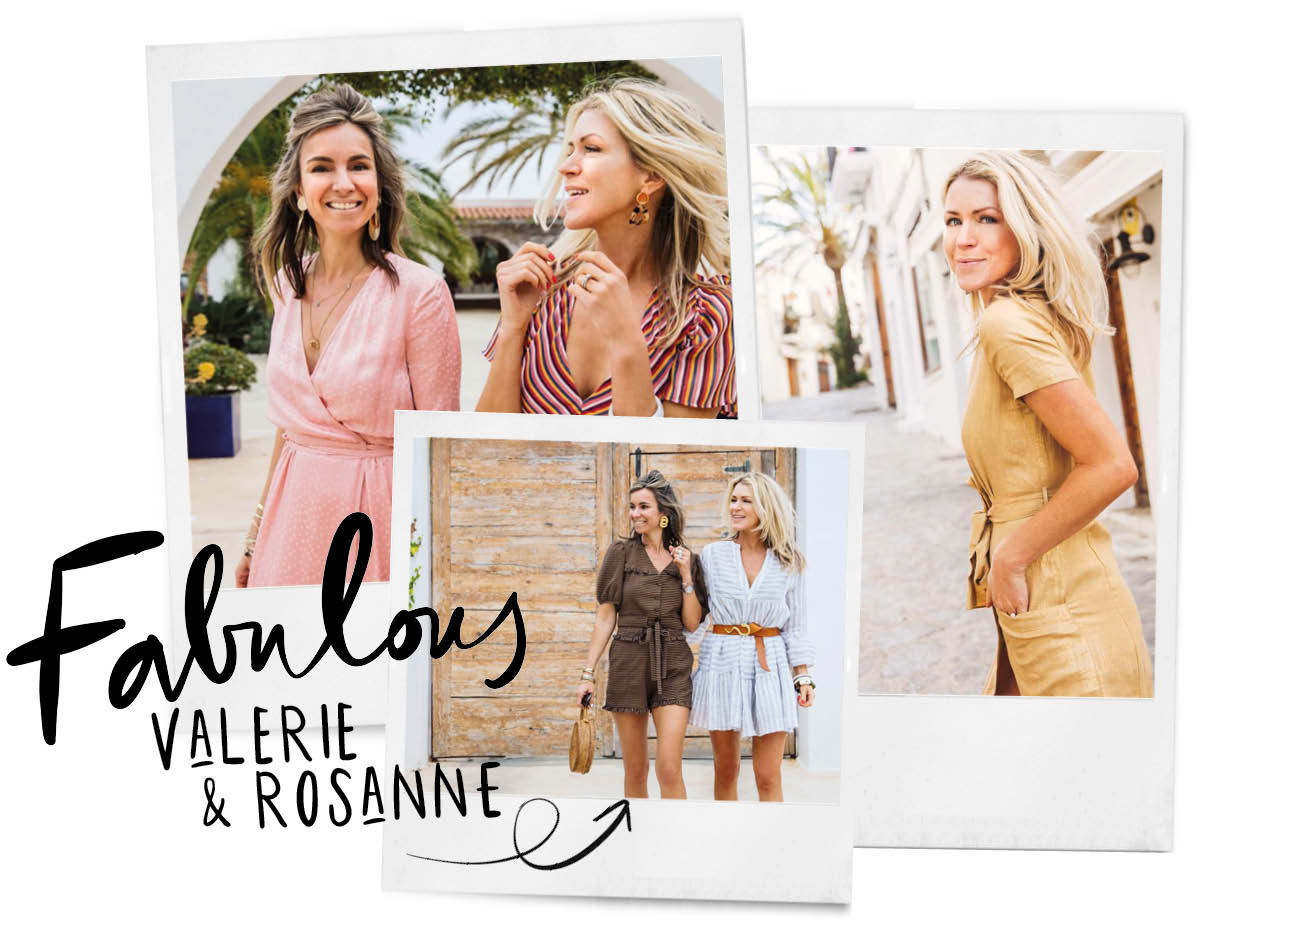 Valerie en Rosanne van ou boutque lachend op de foto in het buitenland zomers